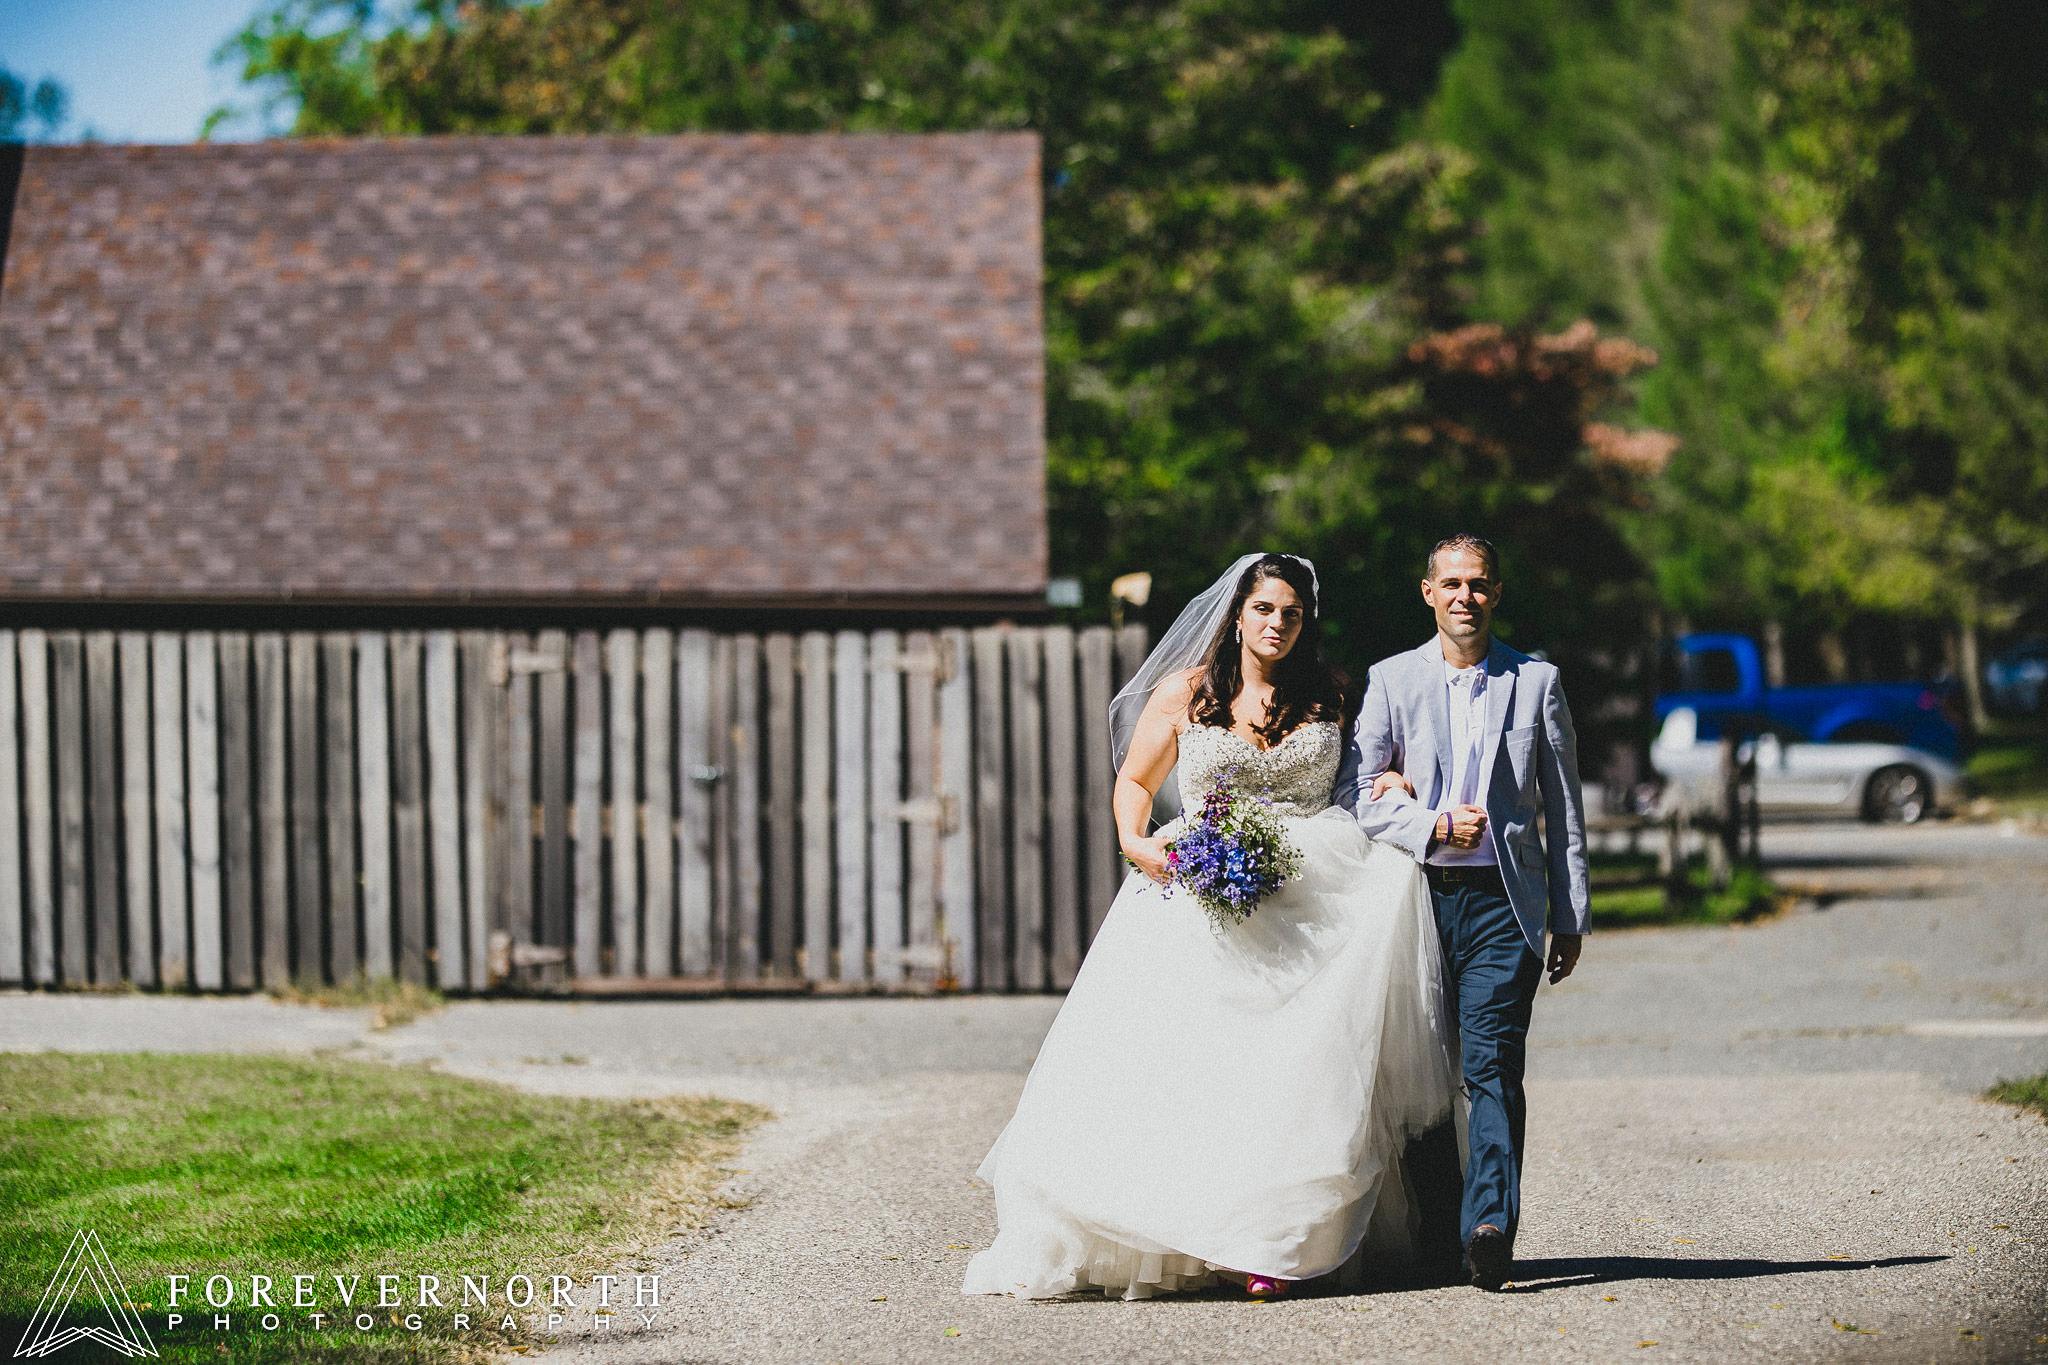 Brown-Allaire-State-Park-Wedding-Photographer-14.JPG